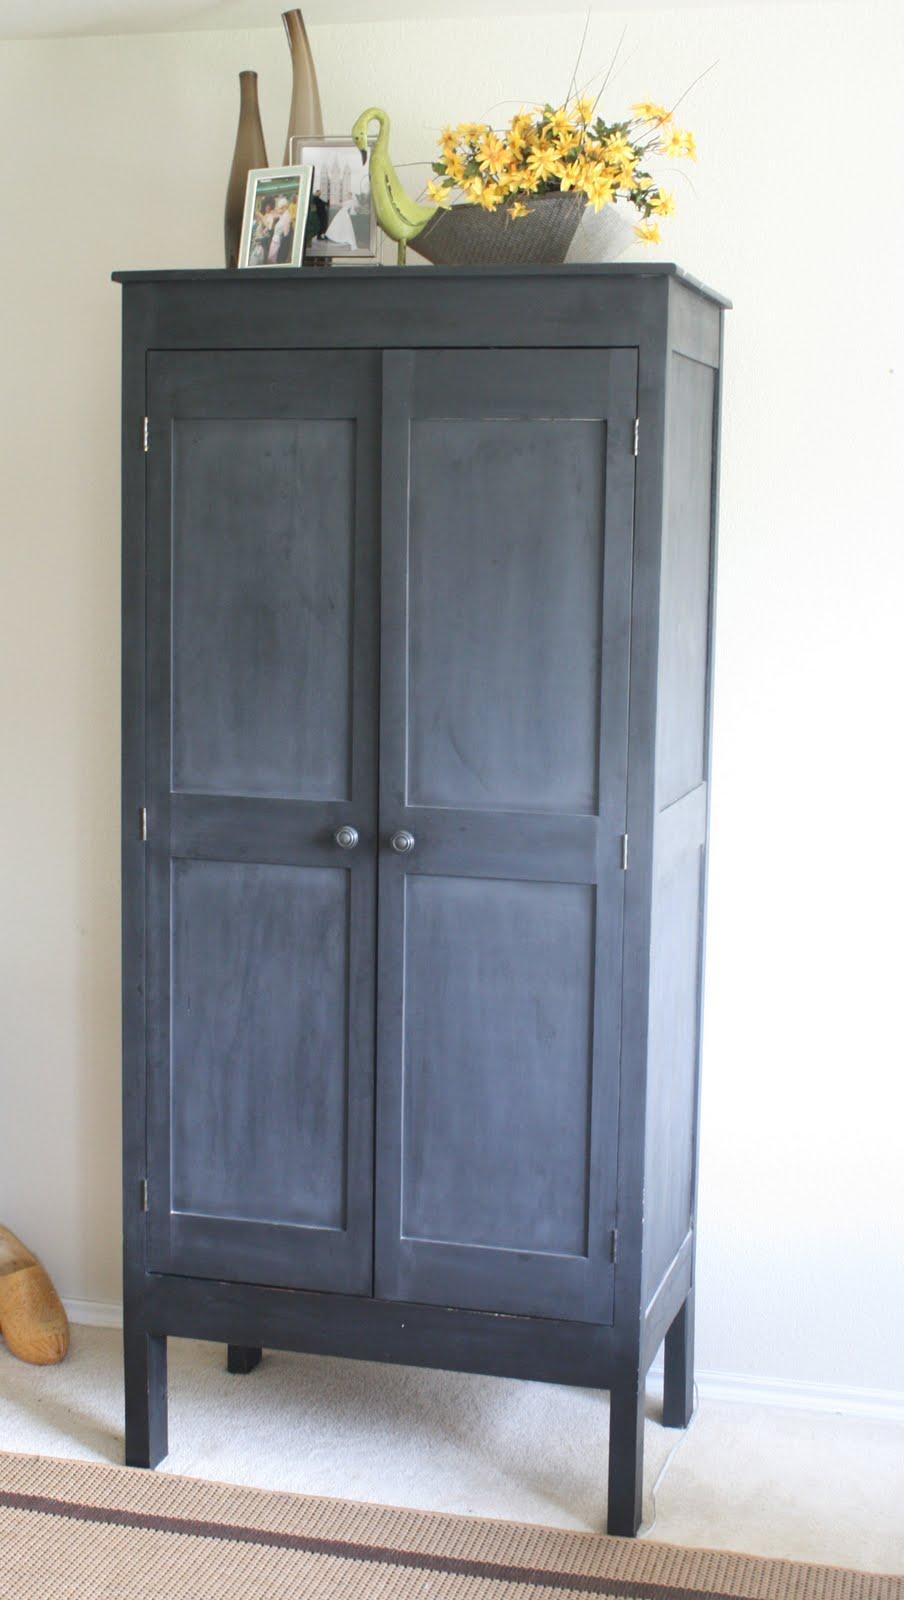 armoire refurbishing she cassity or so she says